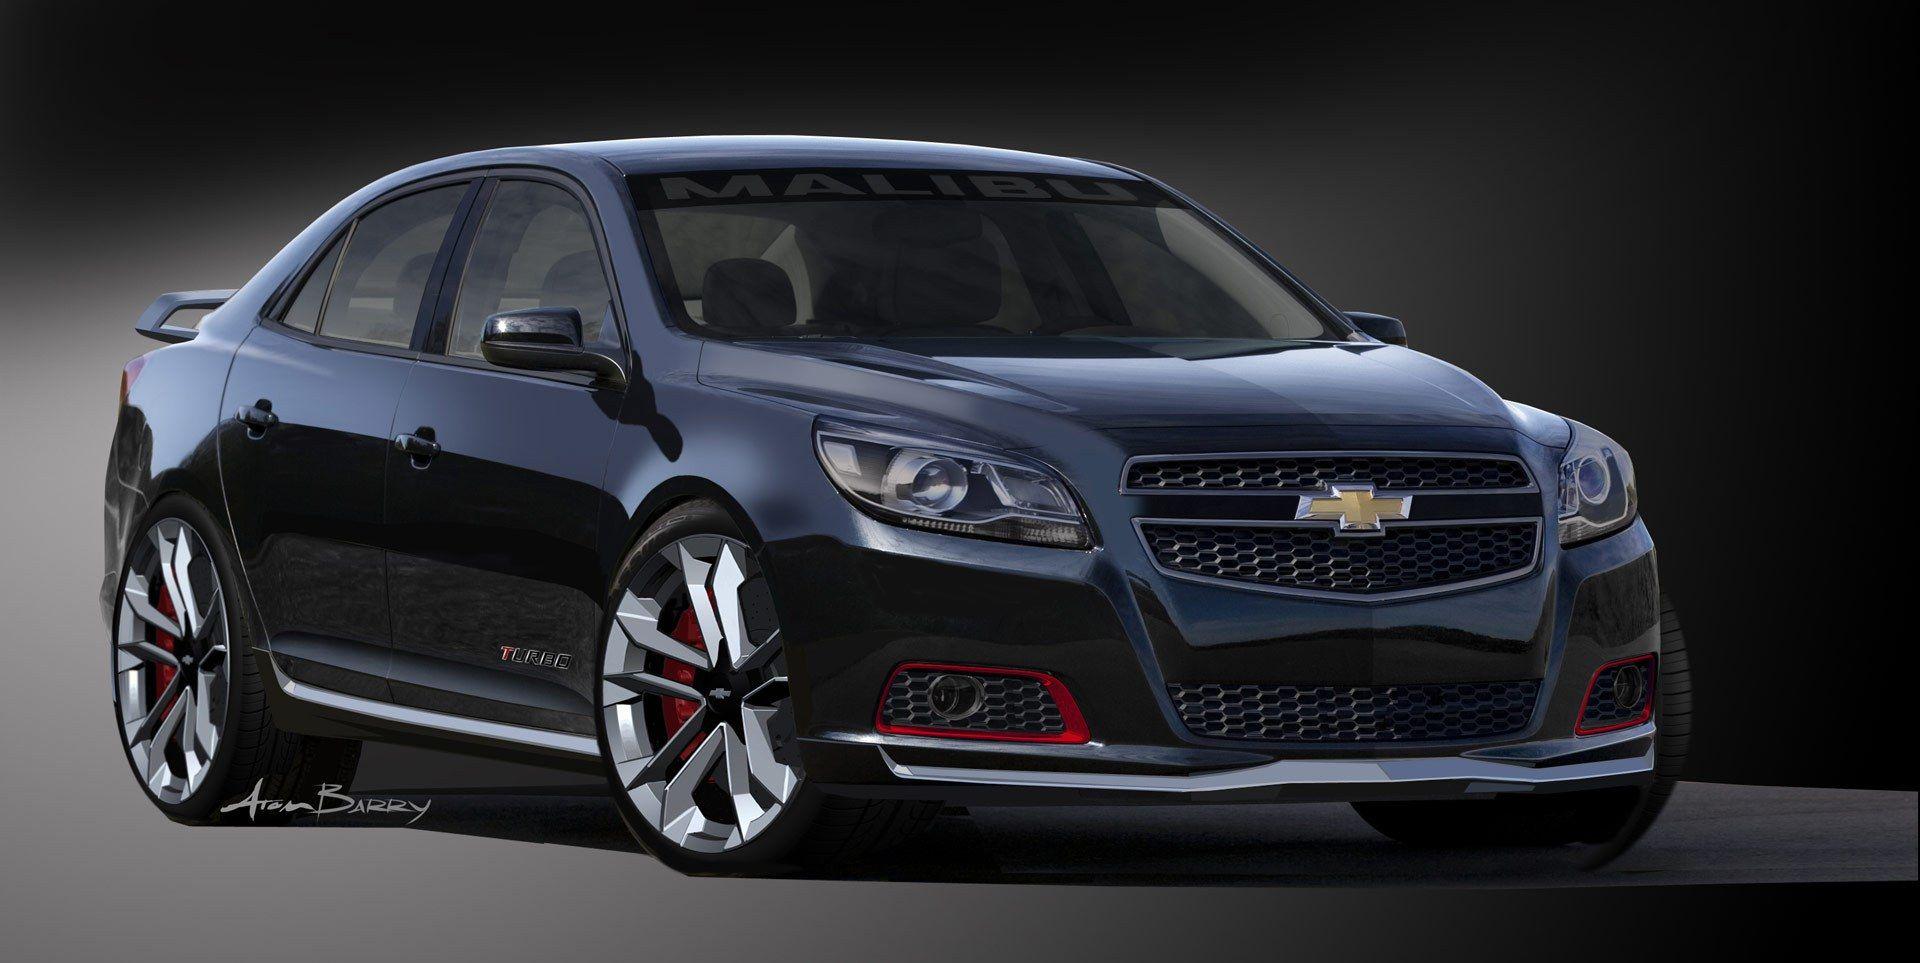 2020 Chevrolet Malibu Redesign Interior And Price Rumors Car